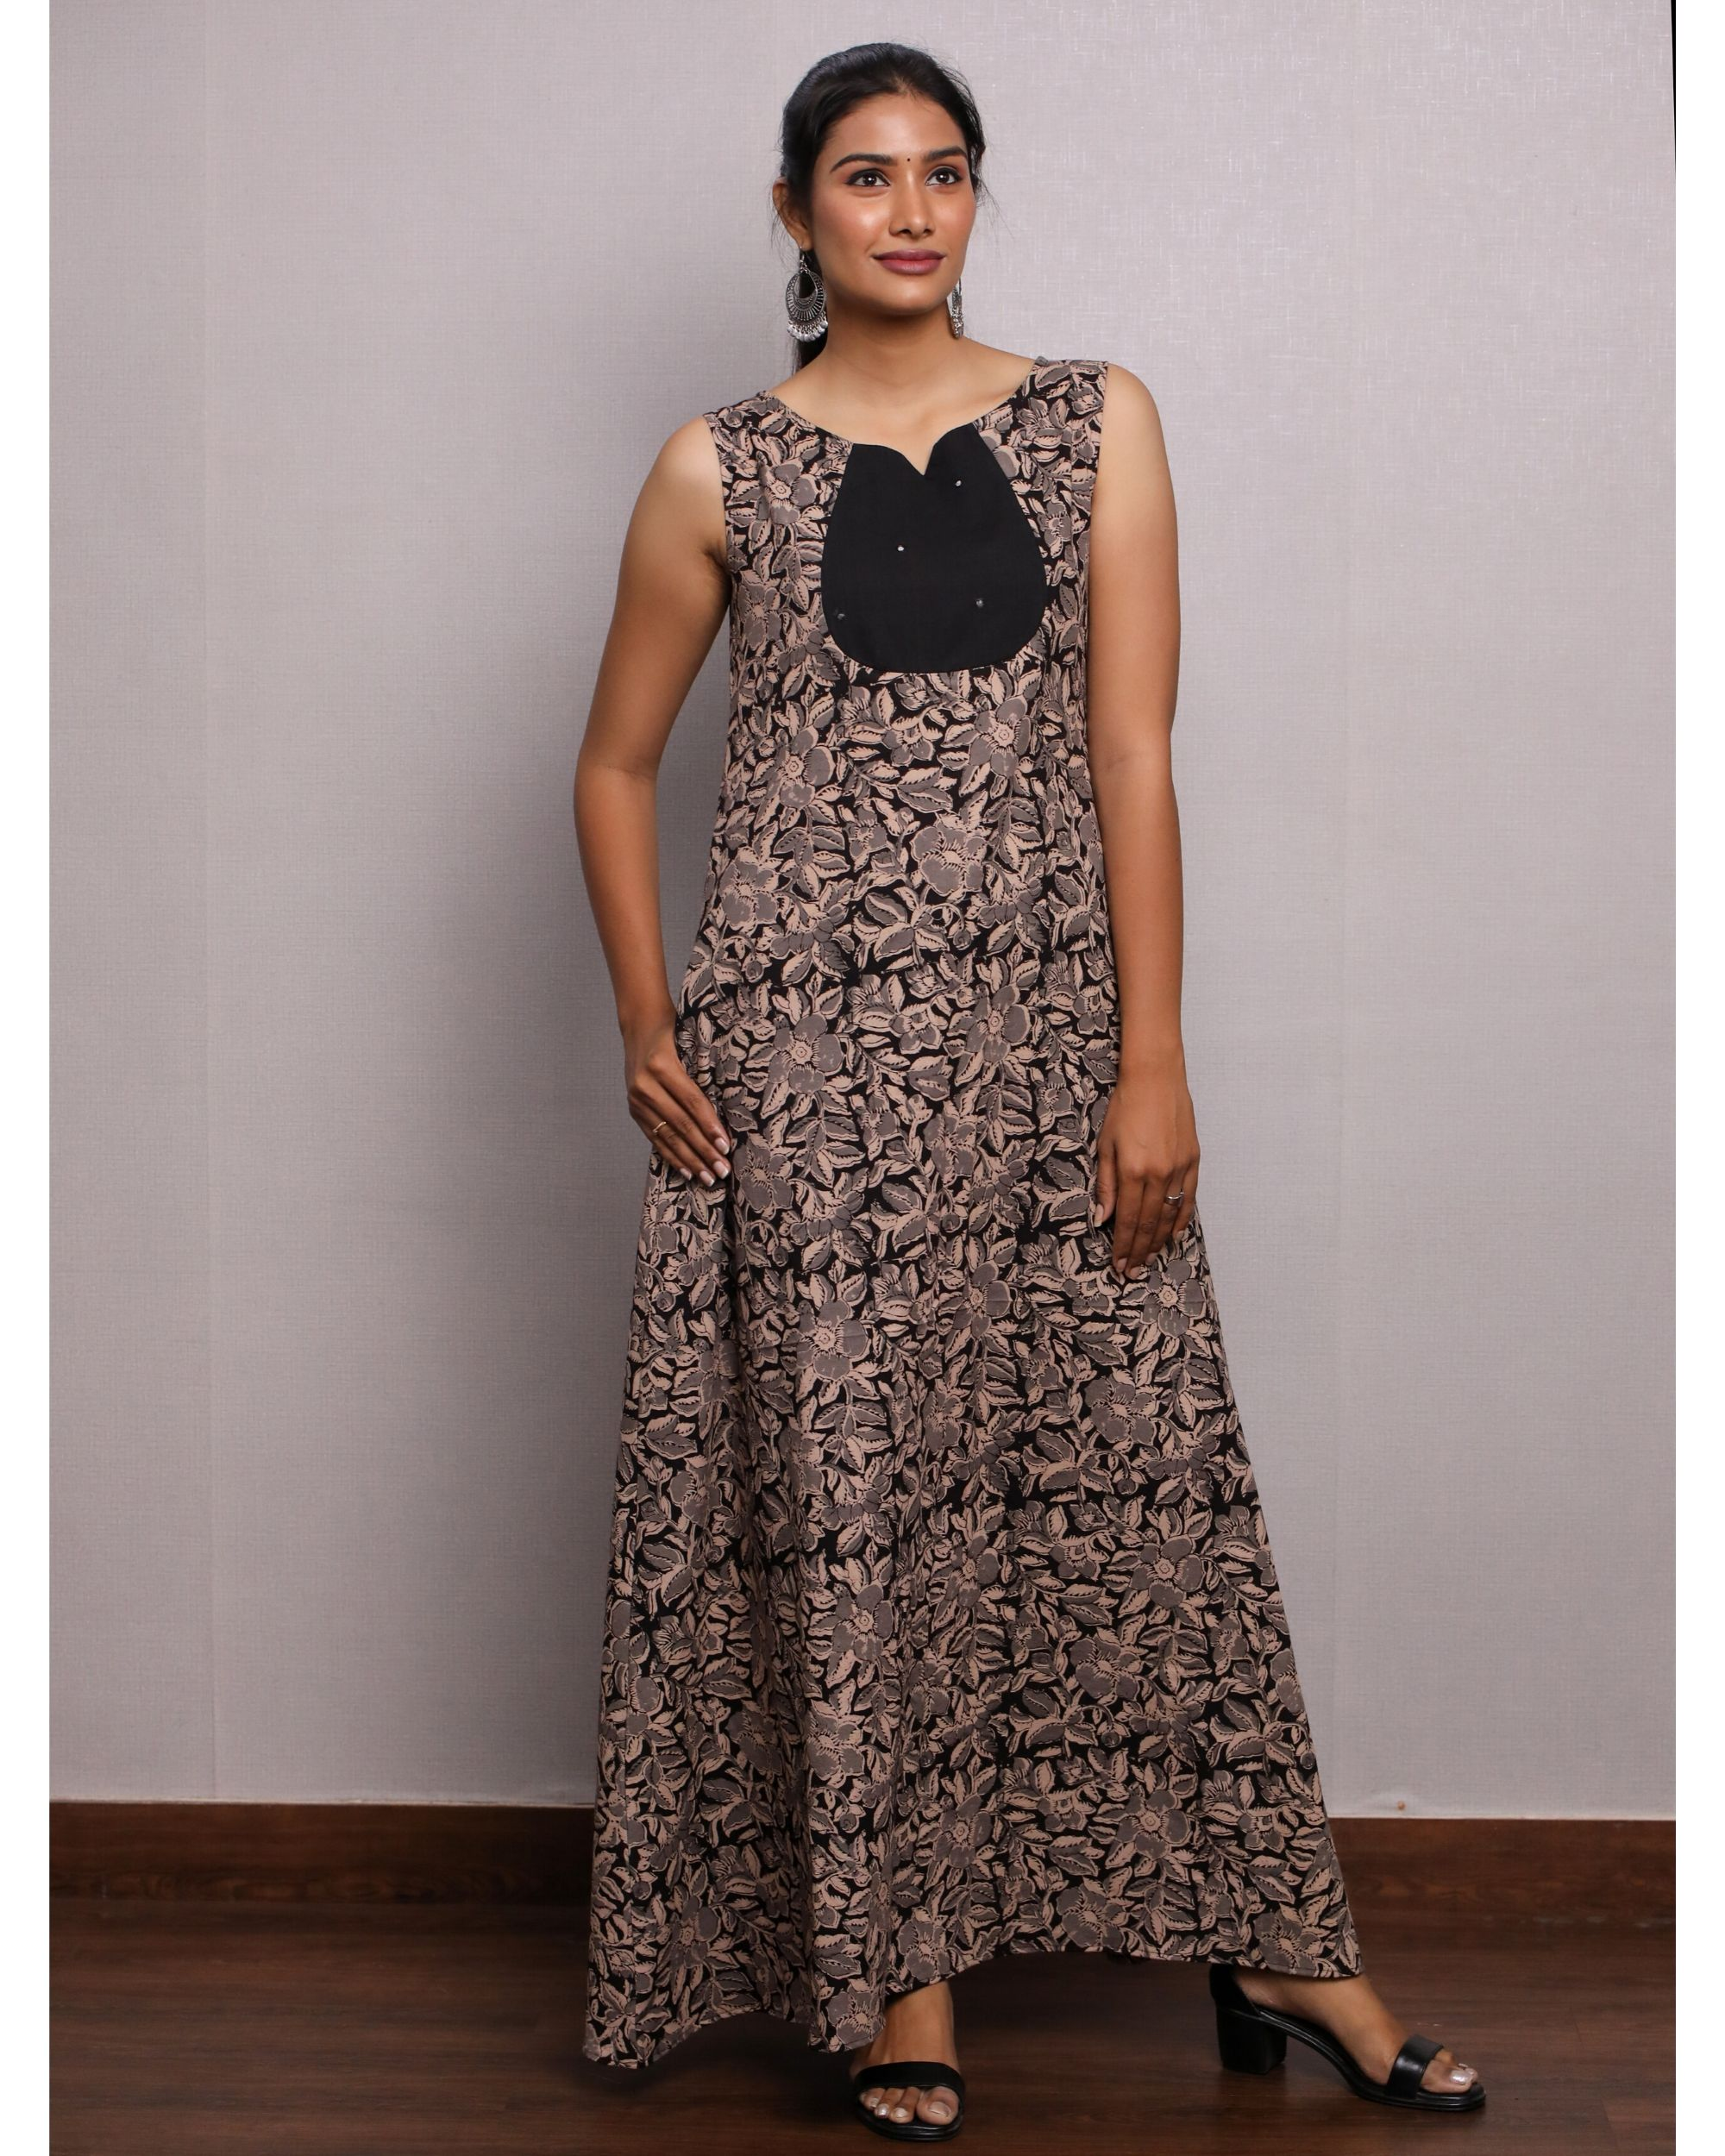 Black kalamkari leaf printed dress